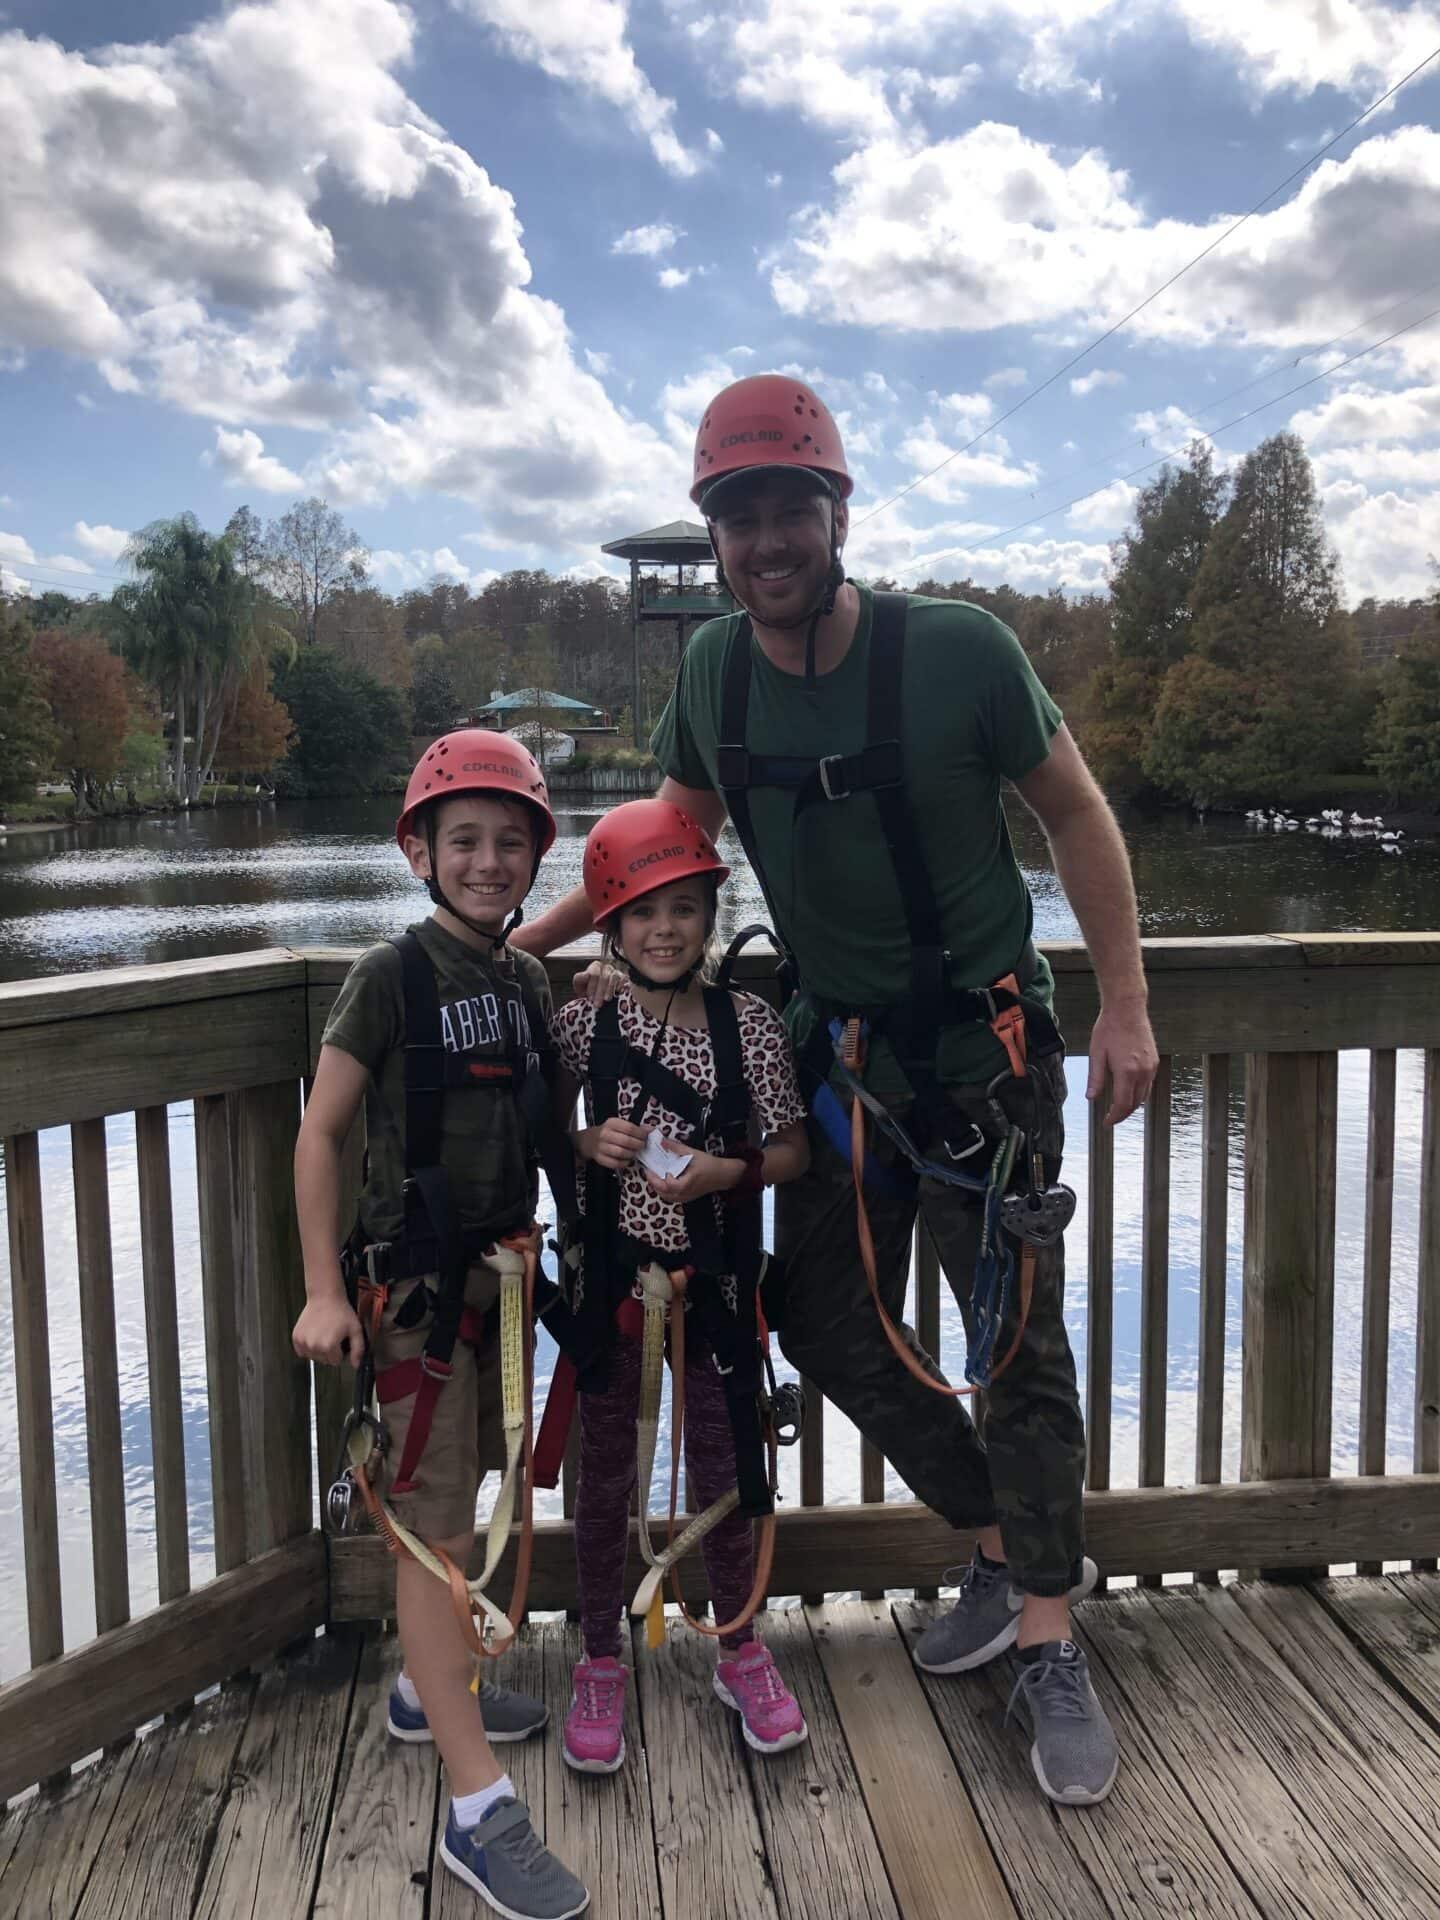 Visiting Gatorland in Orlando, Florida – Ziplining at Gatorland